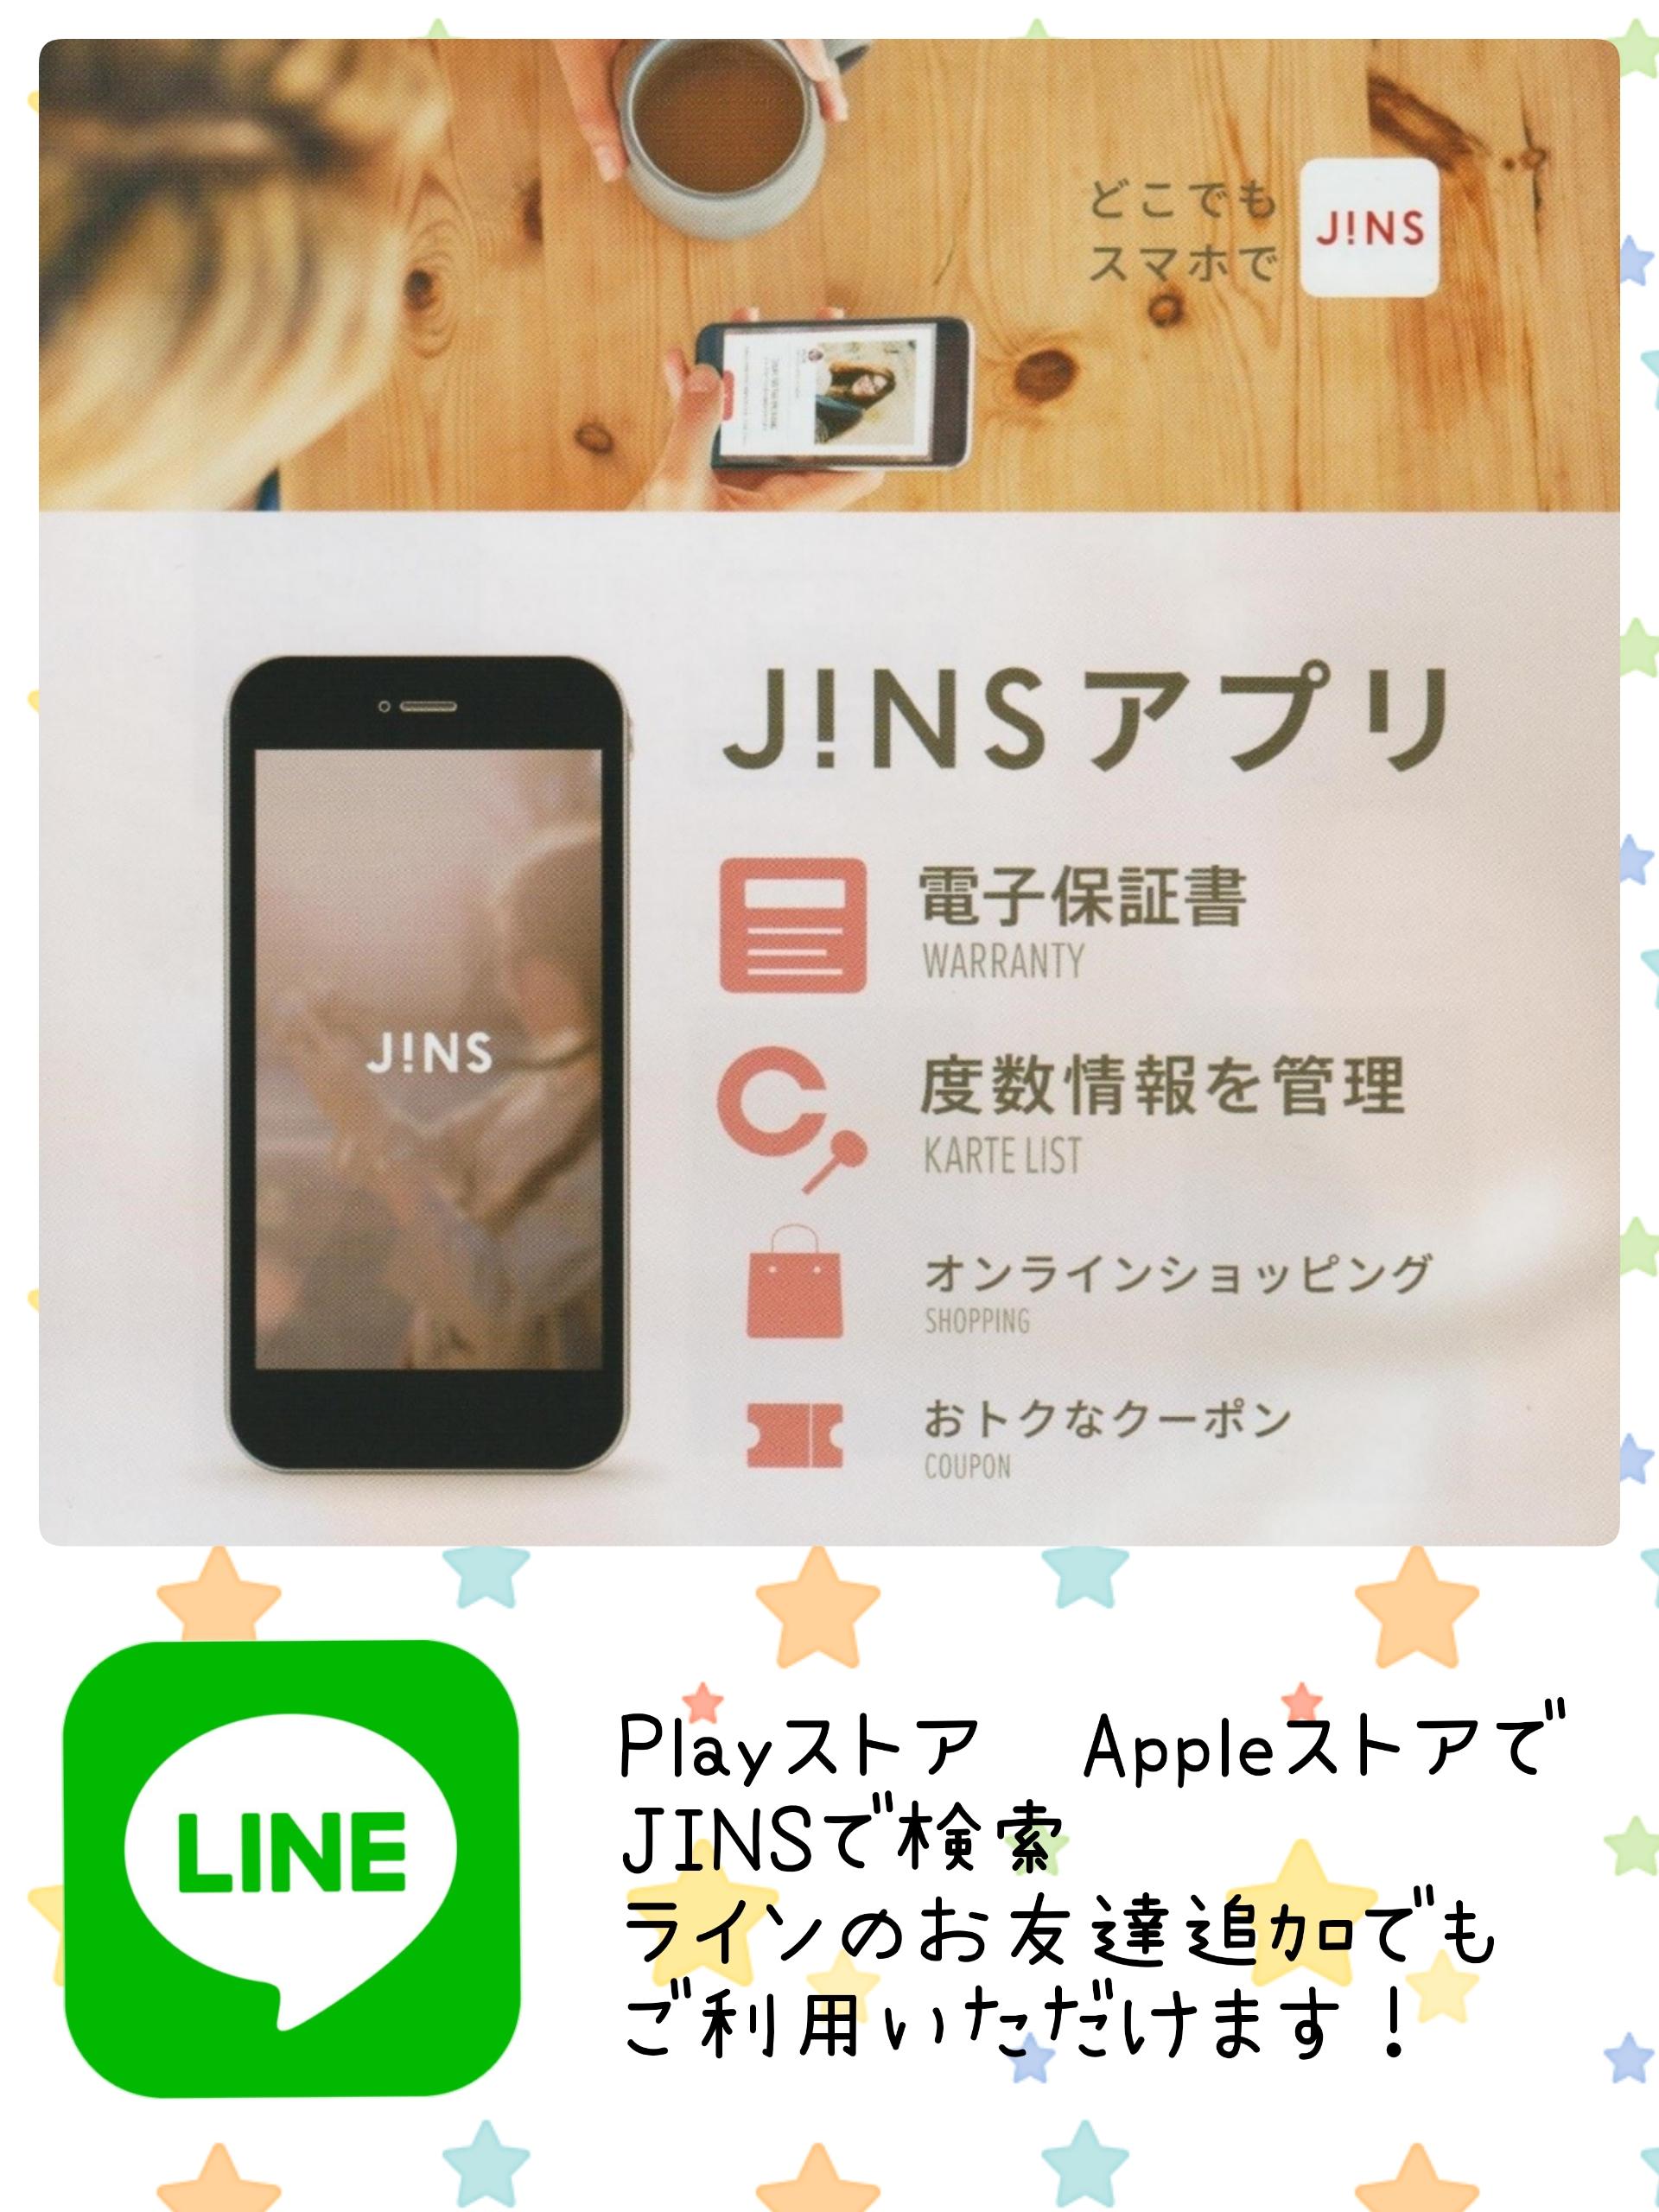 JINSアプリでもっと便利に!どこでもスマホでJINS!